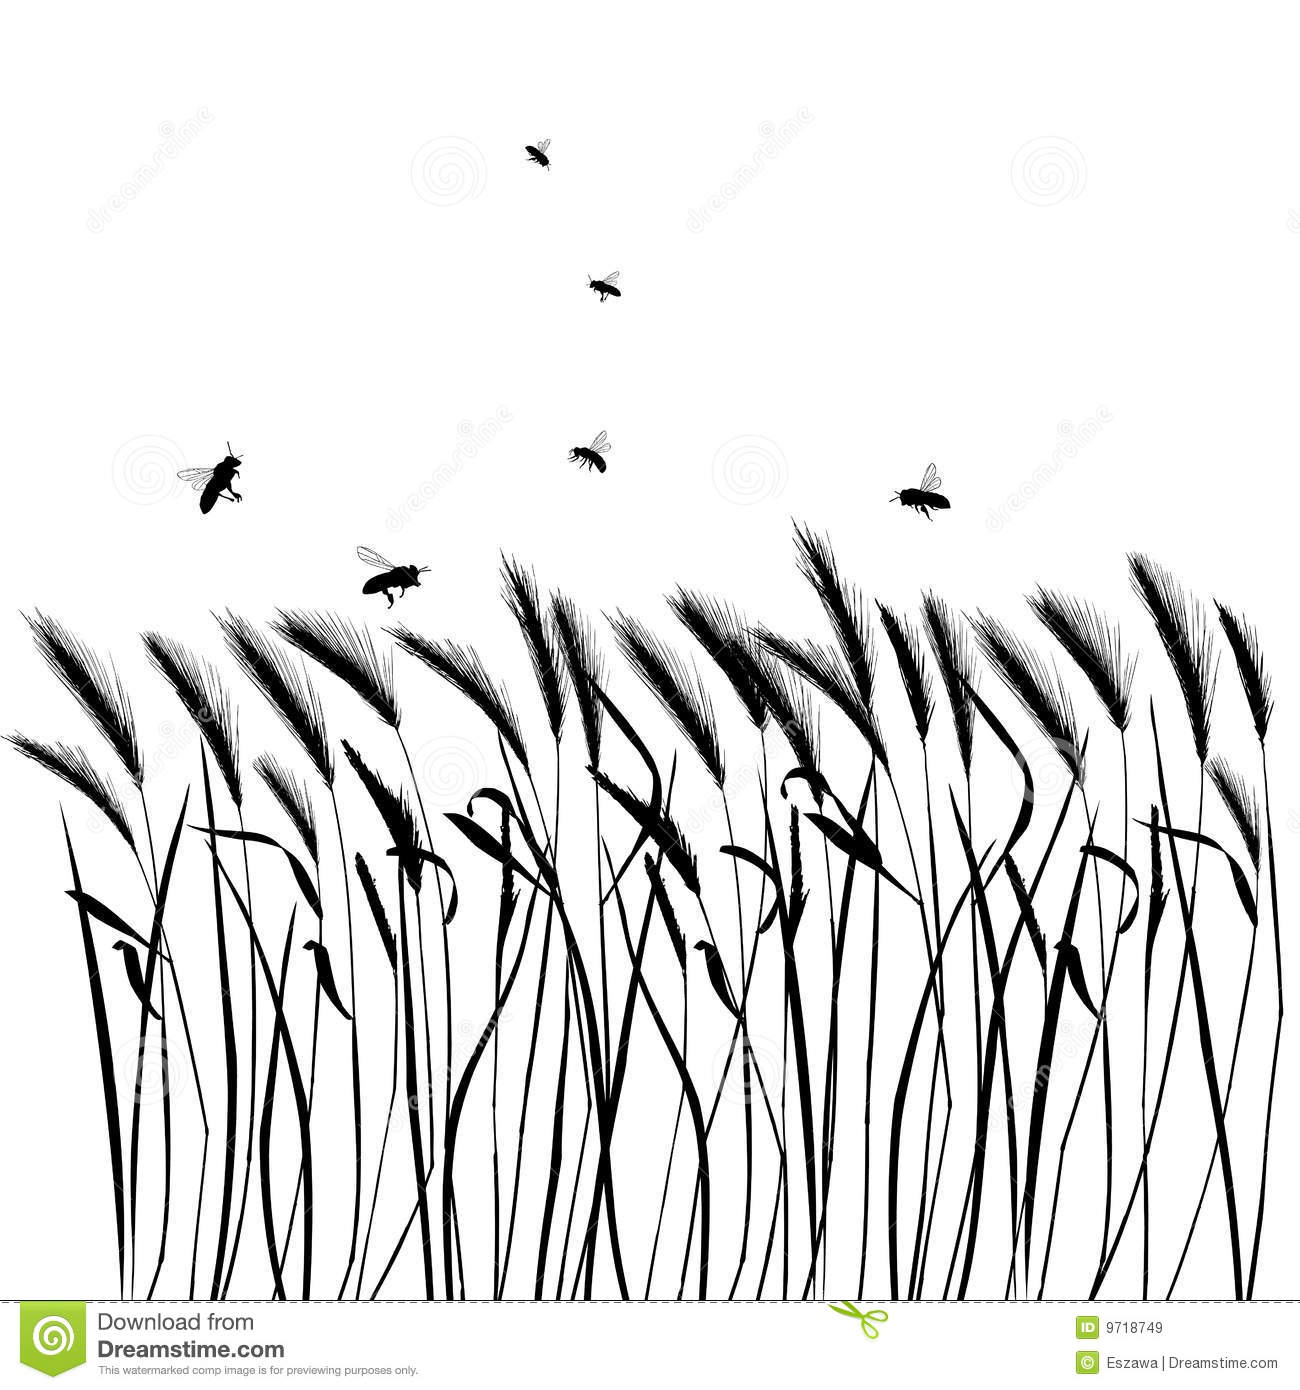 Realistic Grass Drawing At Getdrawings